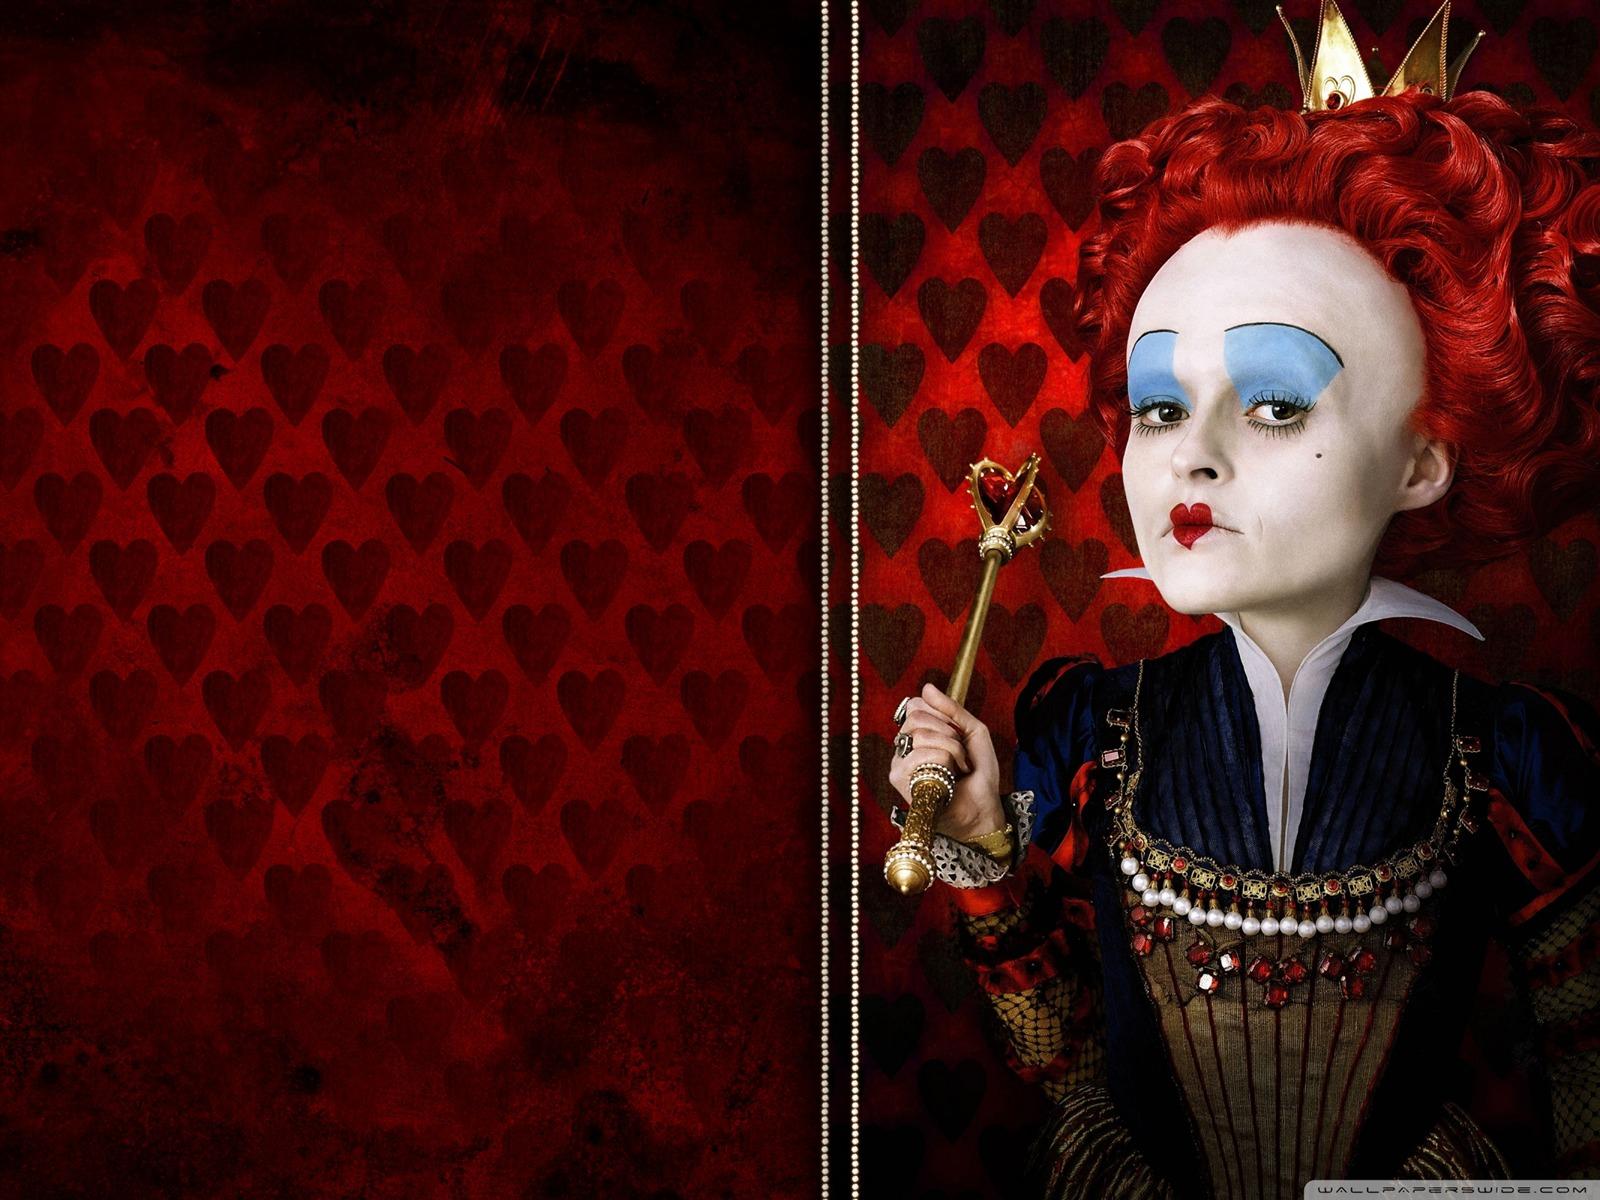 Description queen of hearts Alice in Wonderland Movie HD Wallpaper 01 1600x1200